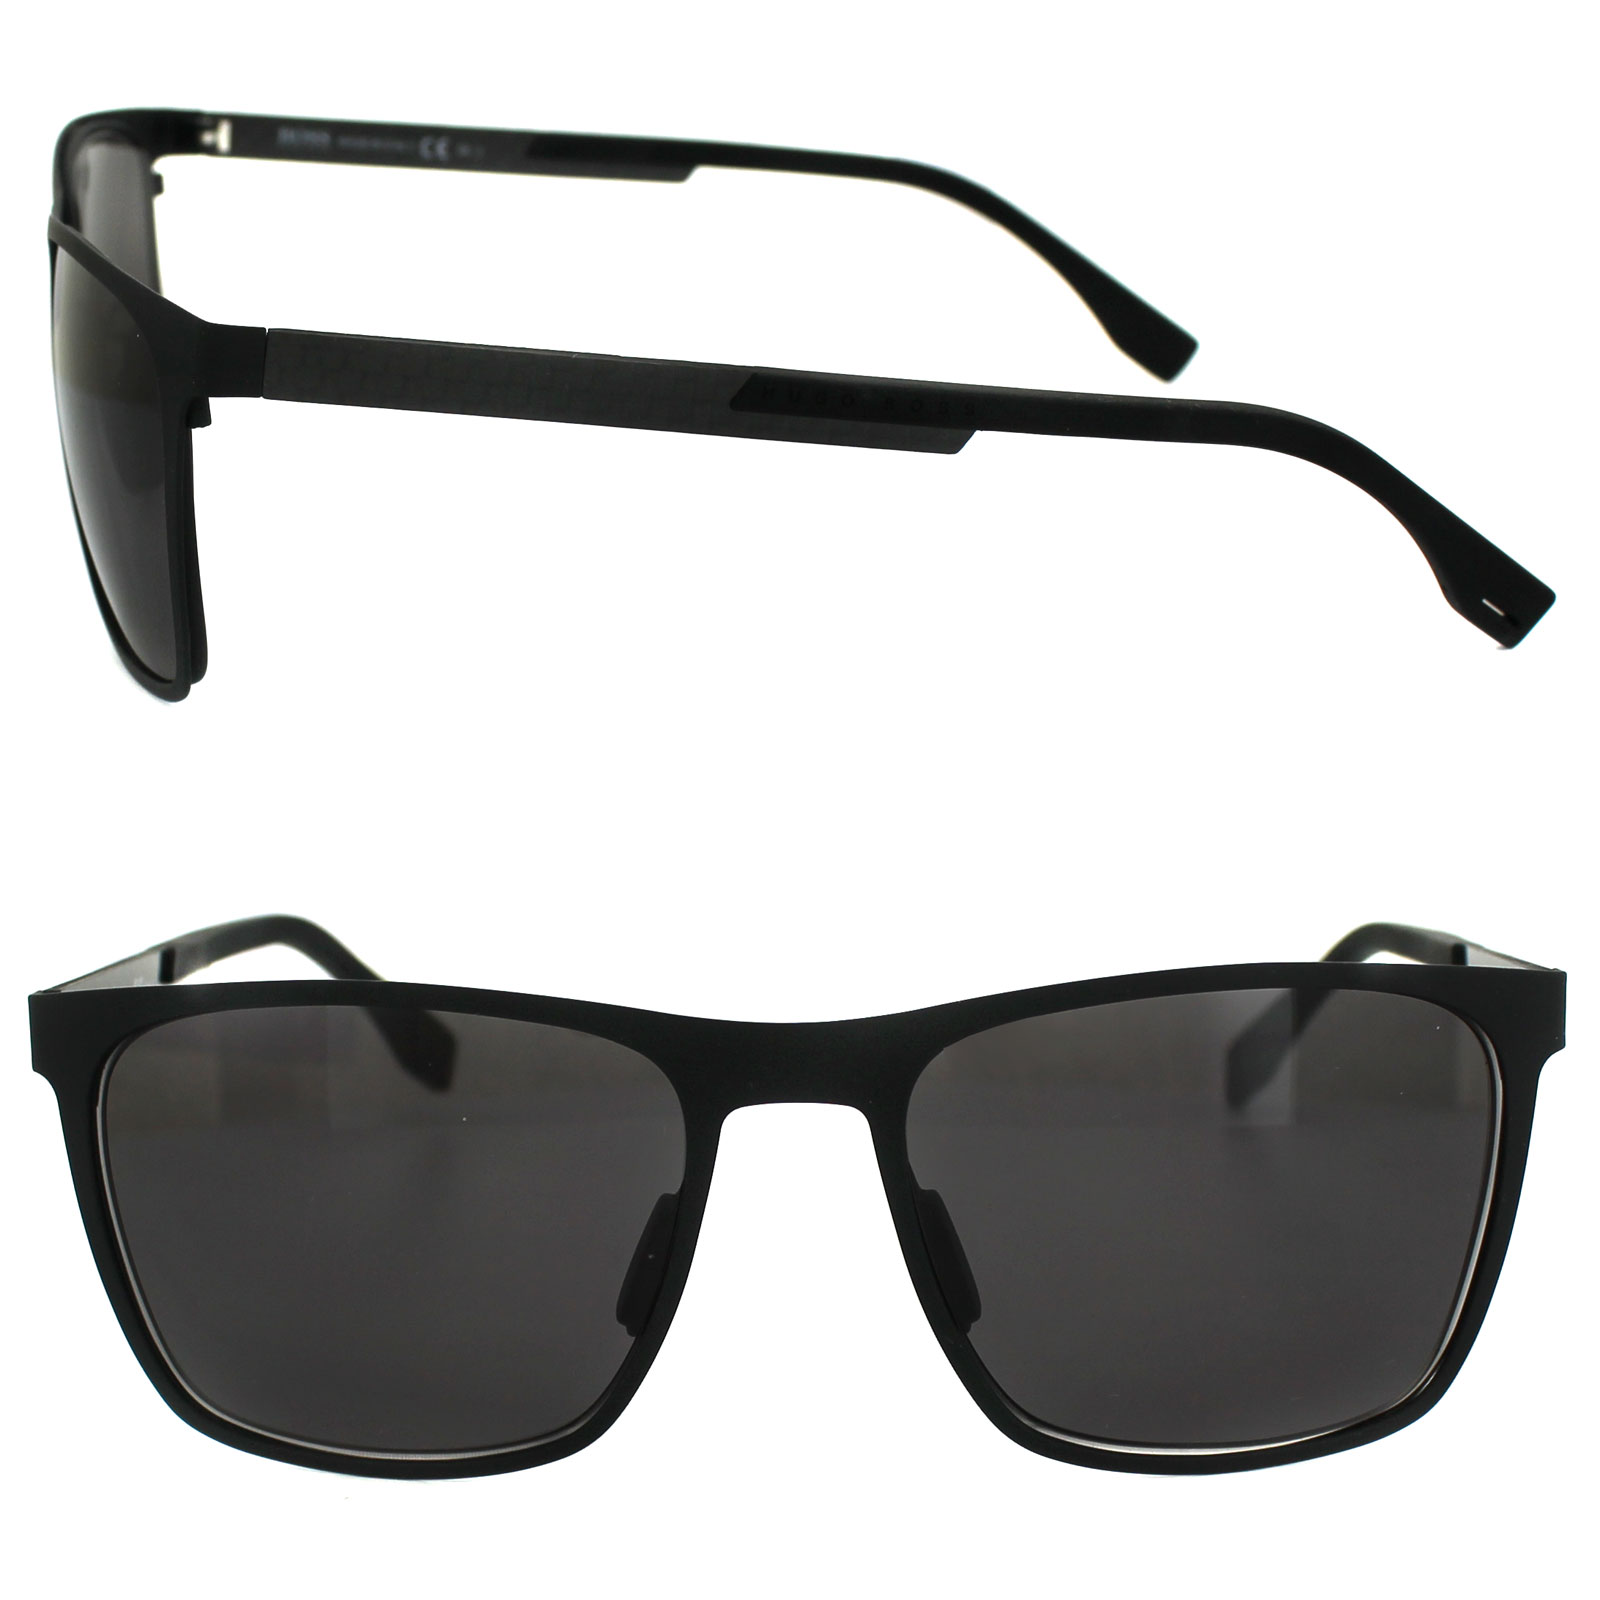 Sentinel Hugo Boss Sunglasses 0732 KCQ Y1 Matt Black Carbon Black Grey